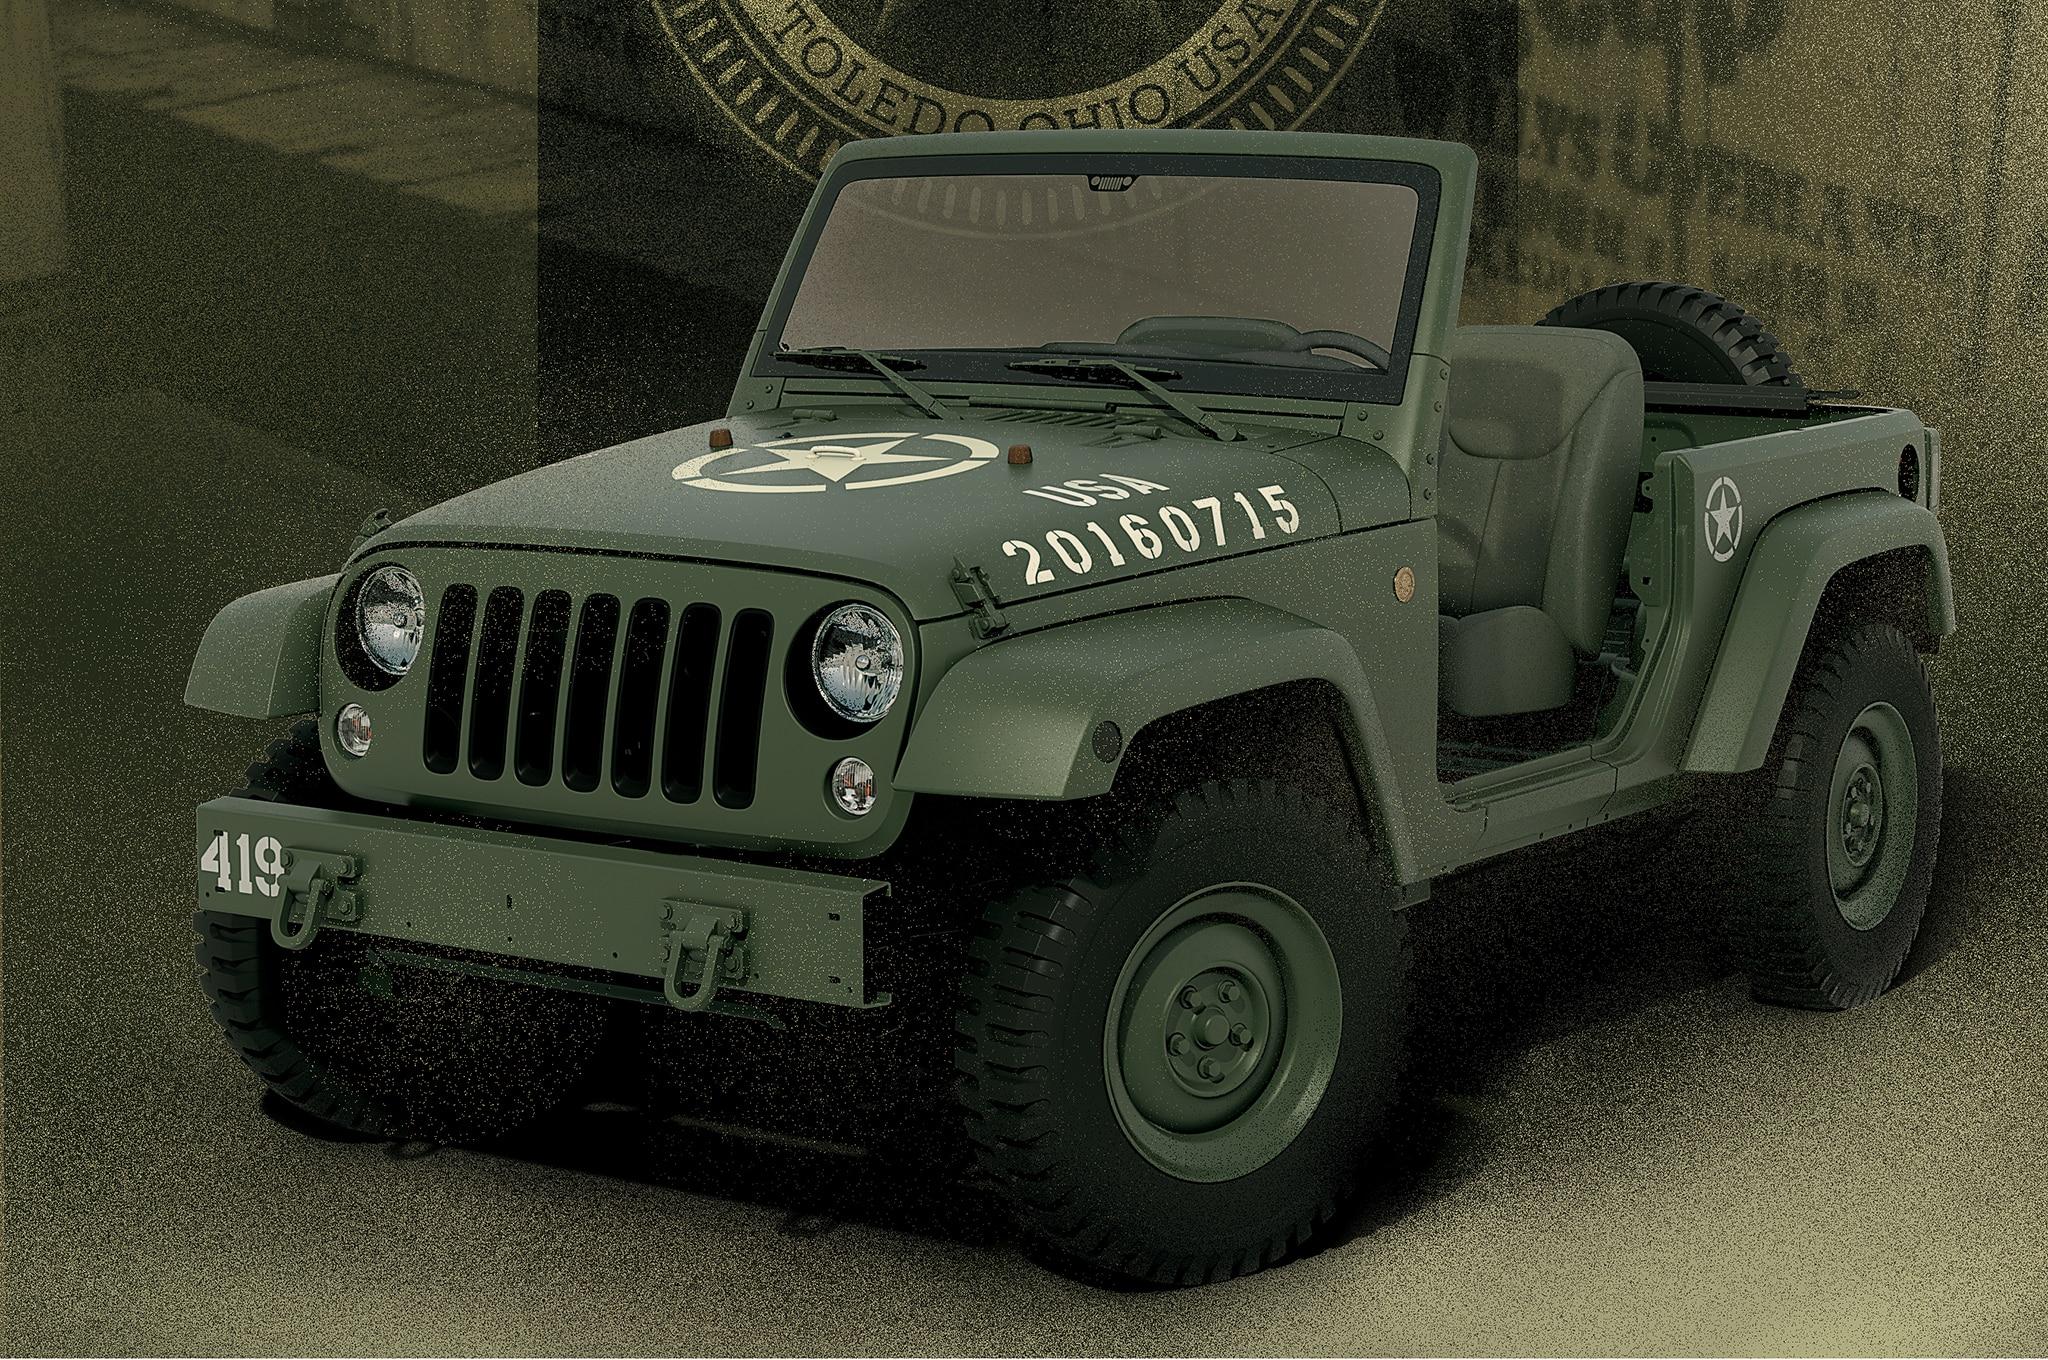 Jeep Wrangler 75th Annivesary salute concept